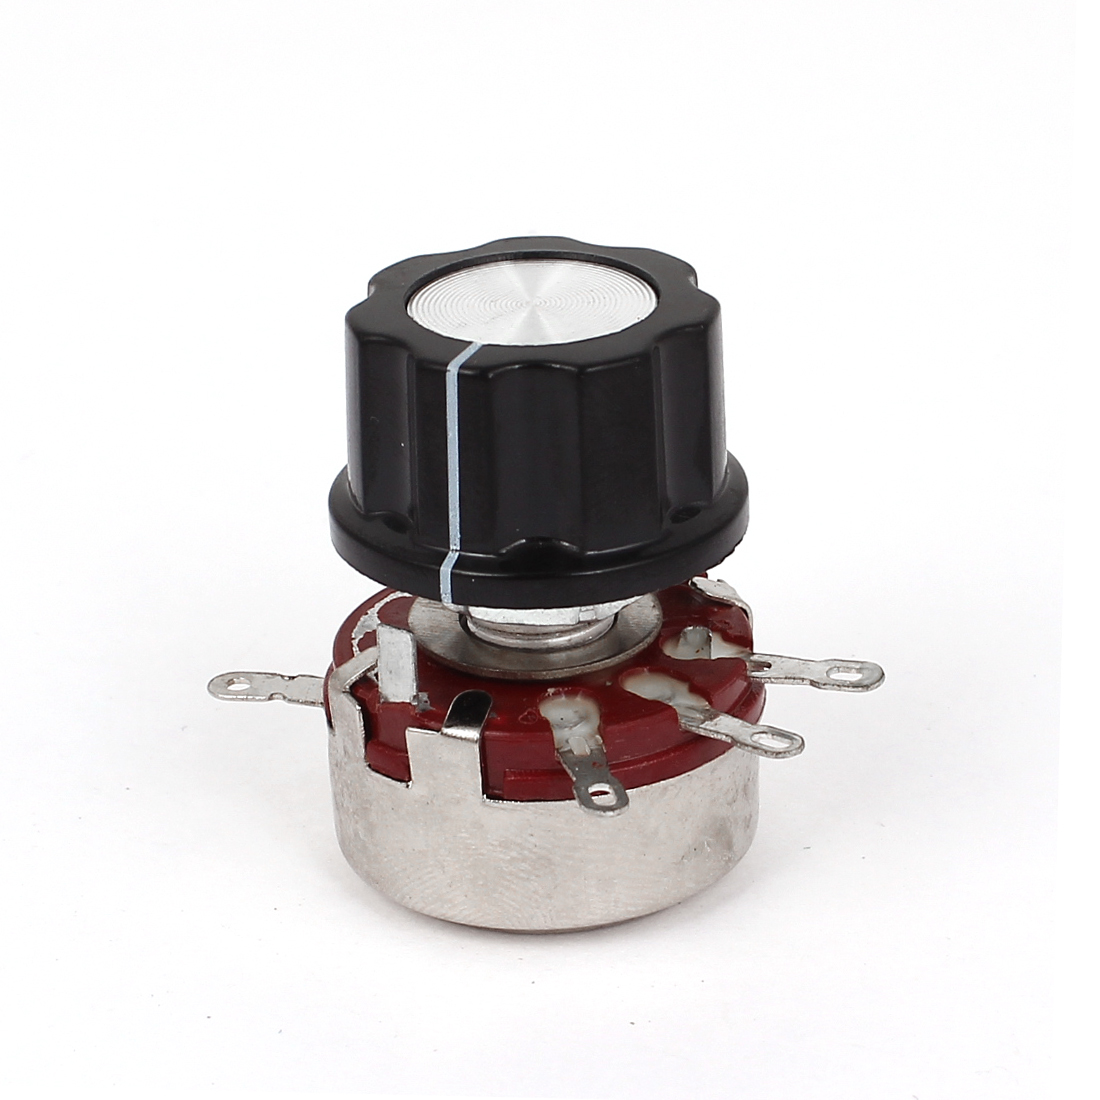 WTH118-1A 2W 4K7 Ohm Rotary Taper Carbon Film Potentiometer Pots w Control Knob